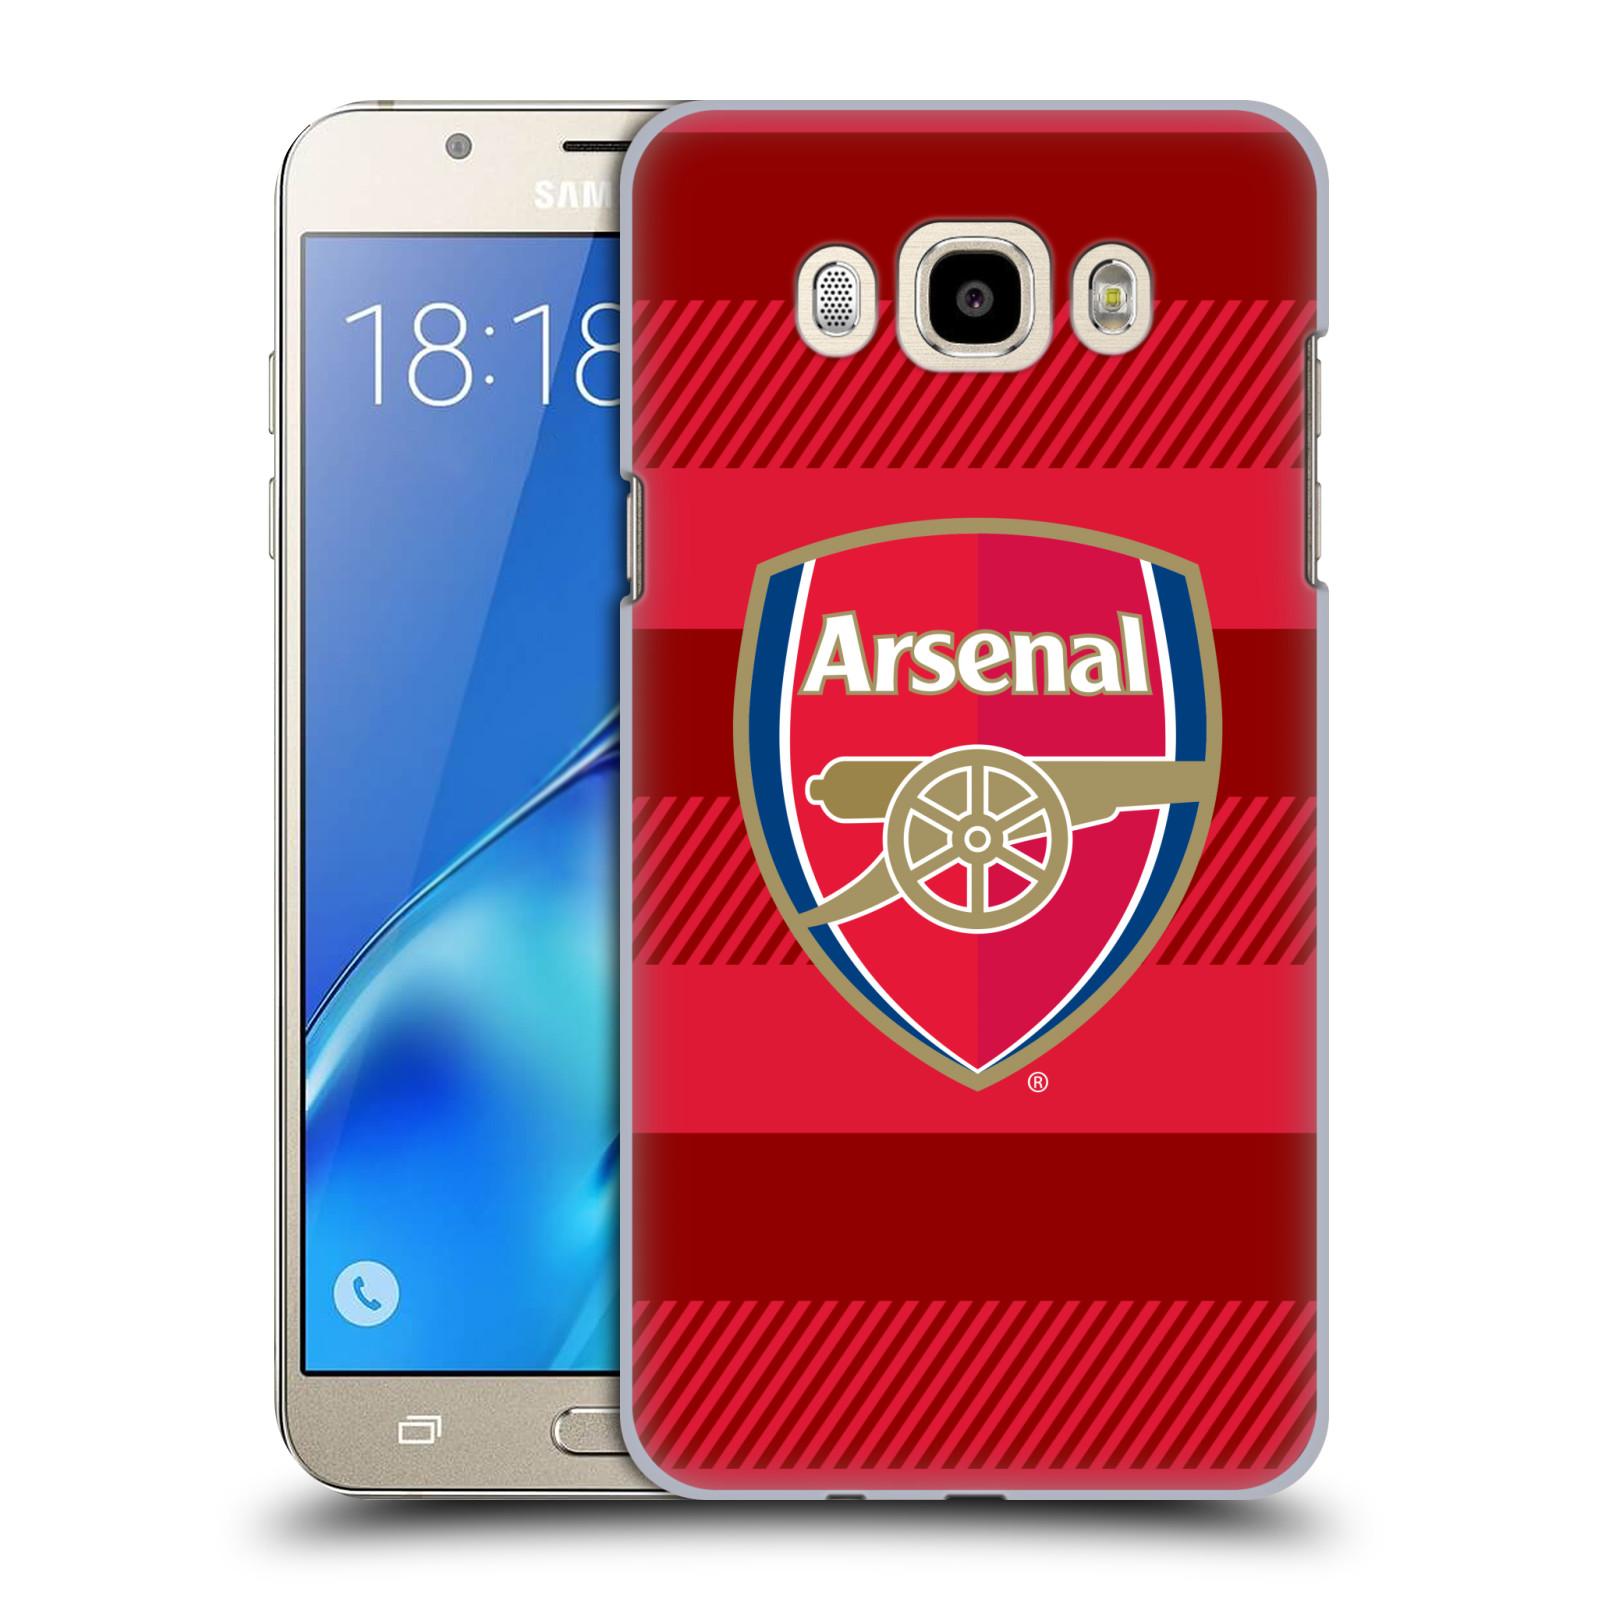 Plastové pouzdro na mobil Samsung Galaxy J7 (2016) - Head Case - Arsenal FC - Logo s pruhy